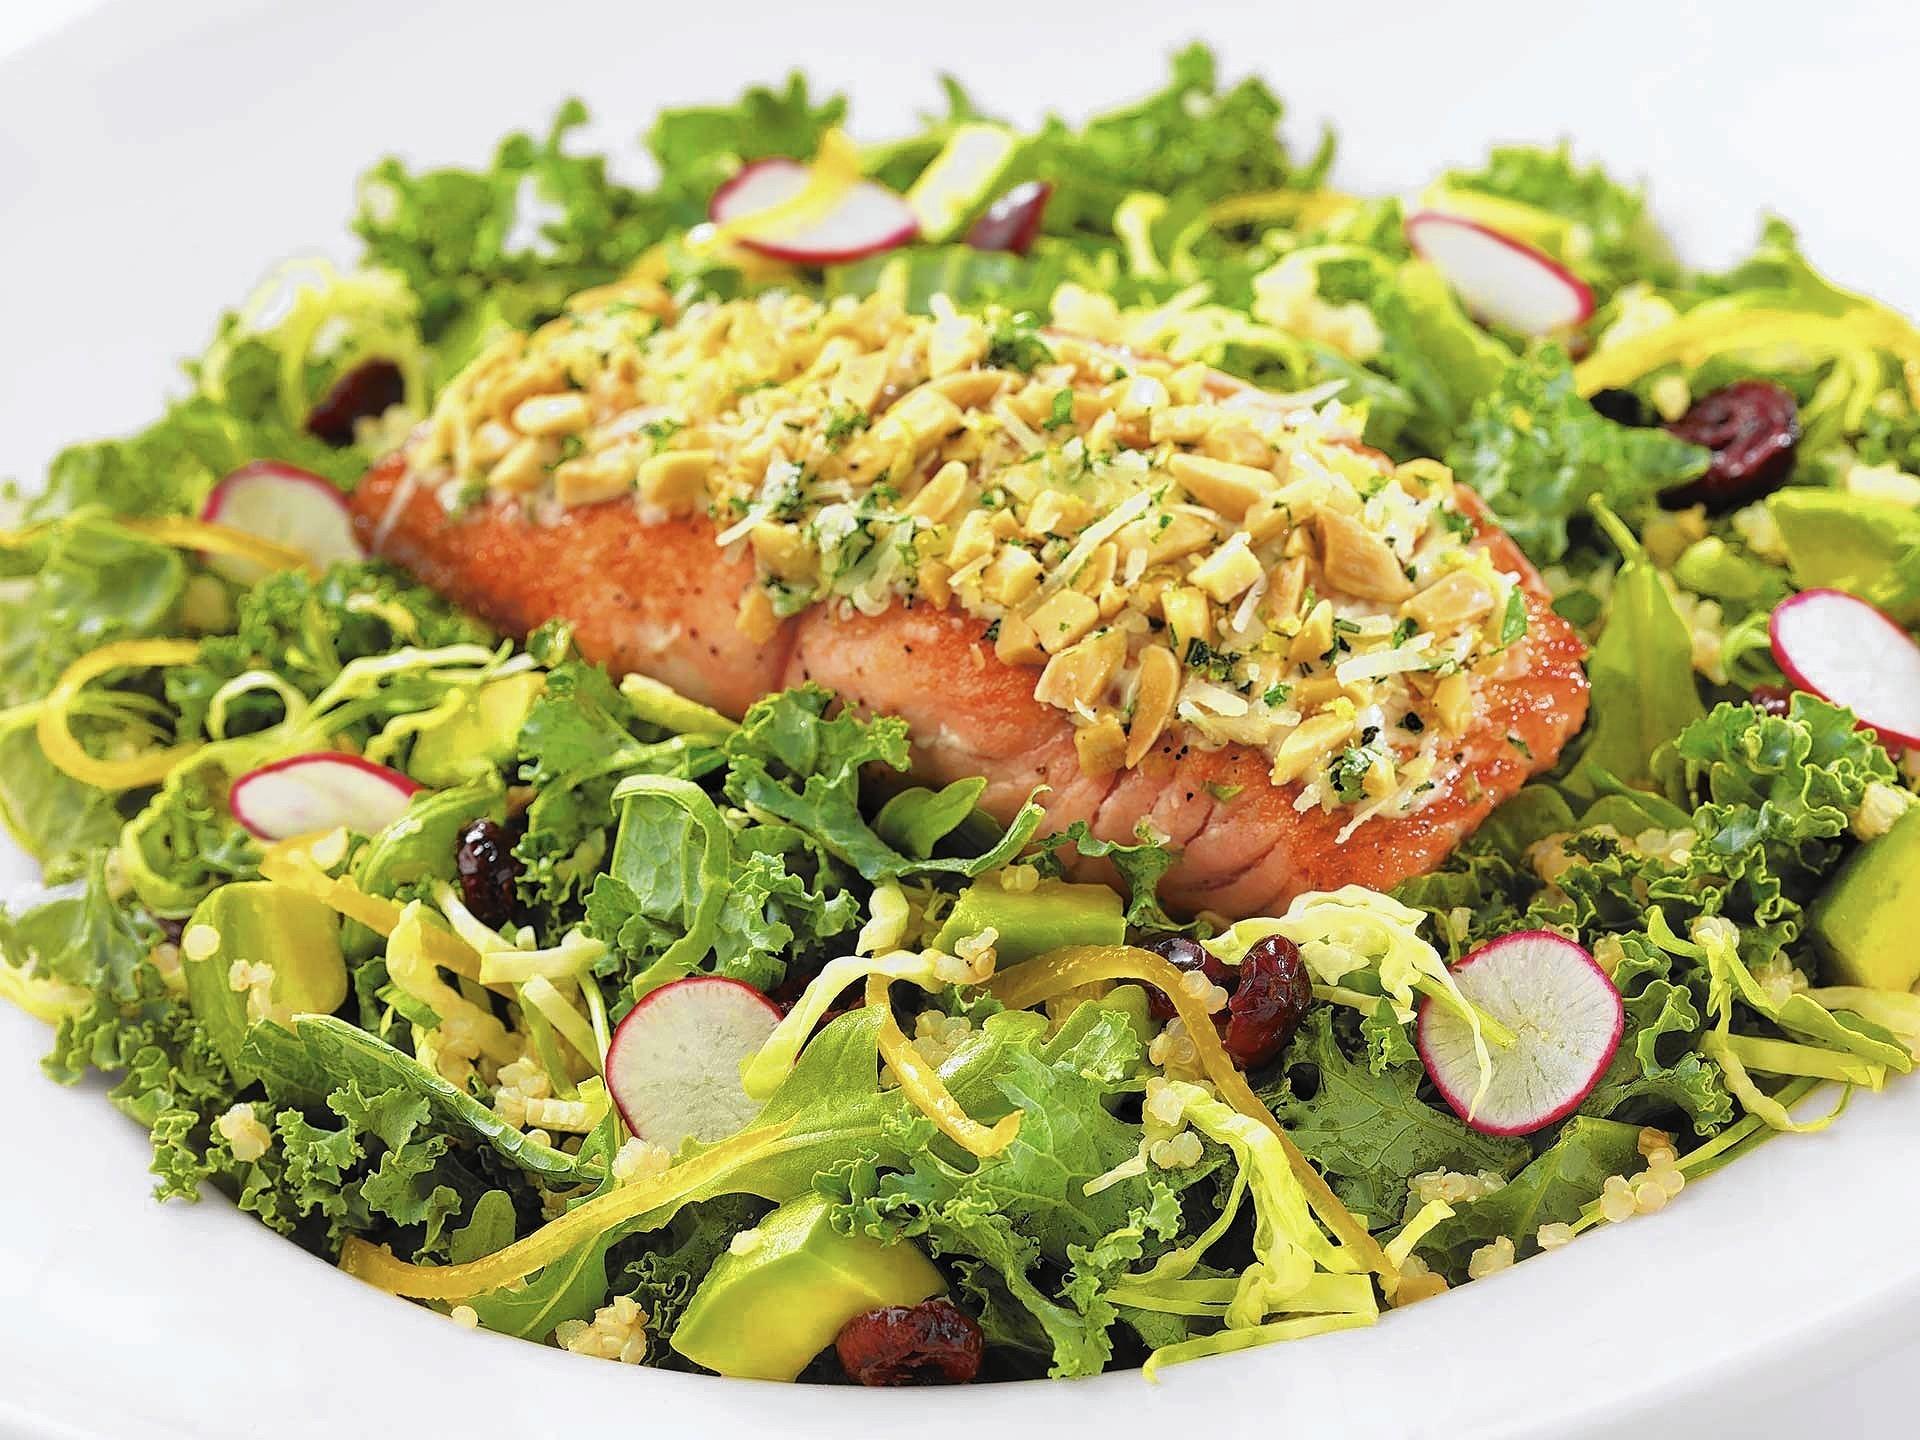 Cheesecake Factory Salmon Salad recipe - Orlando Sentinel